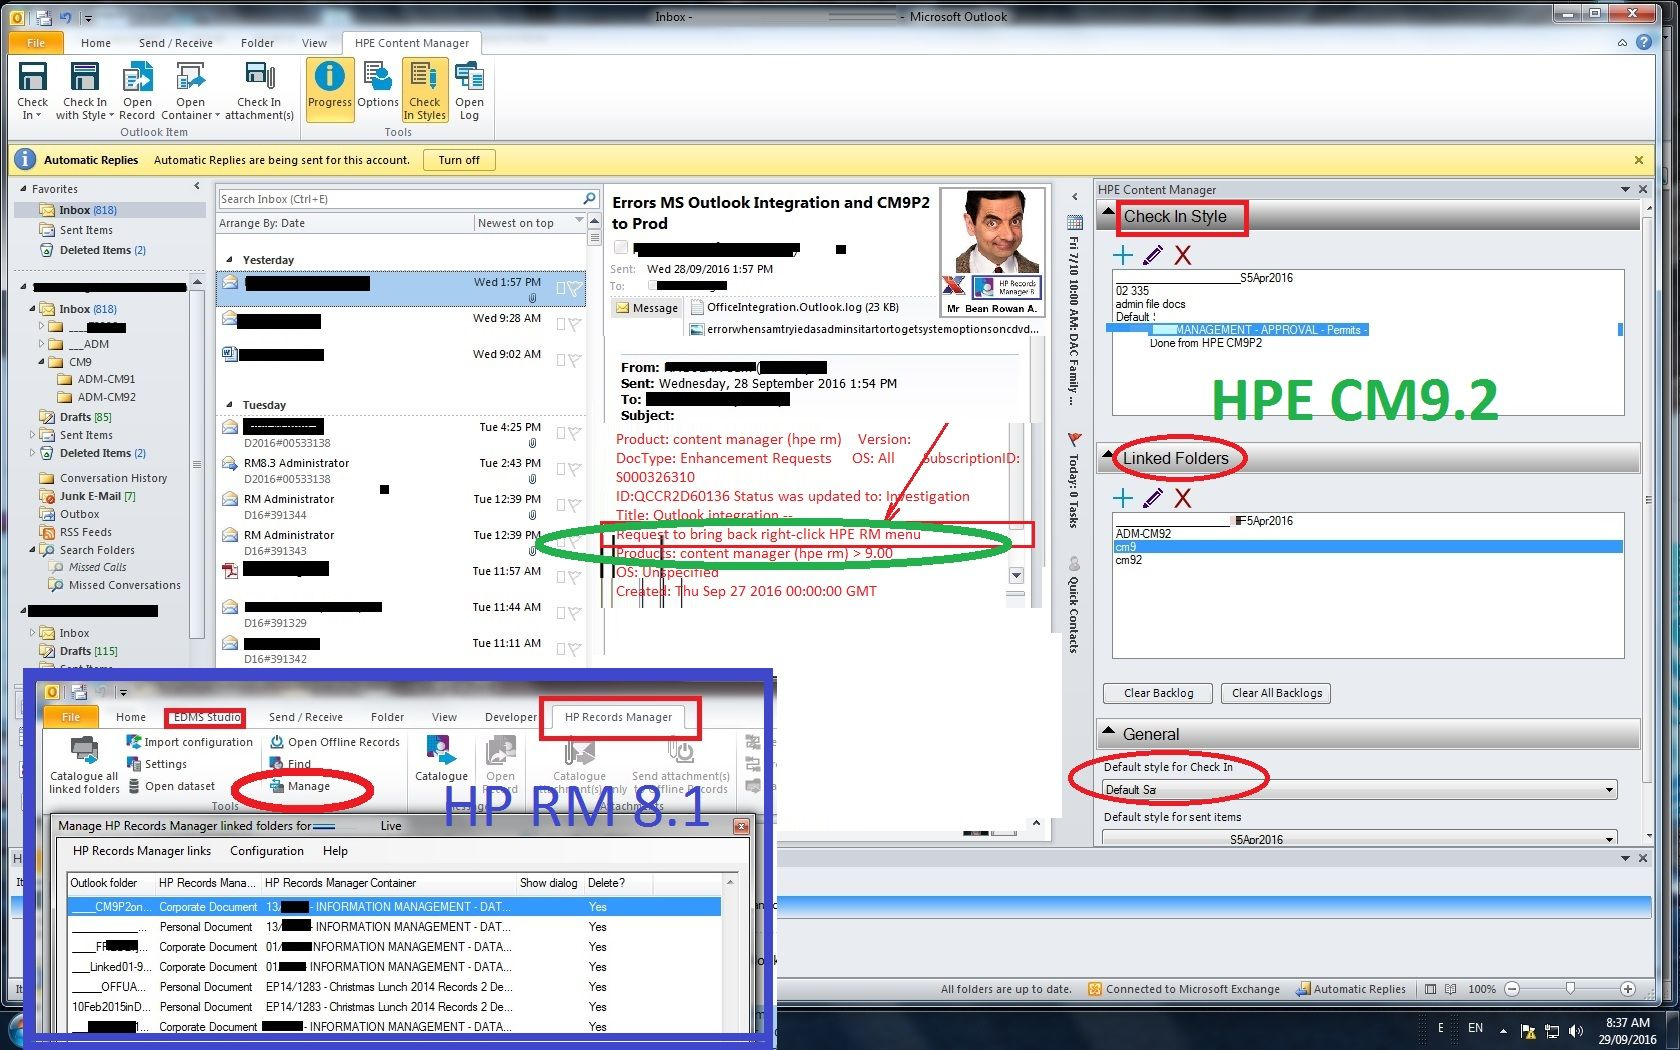 forumhpecm9msoutlookintegration2016error - Copy.jpg